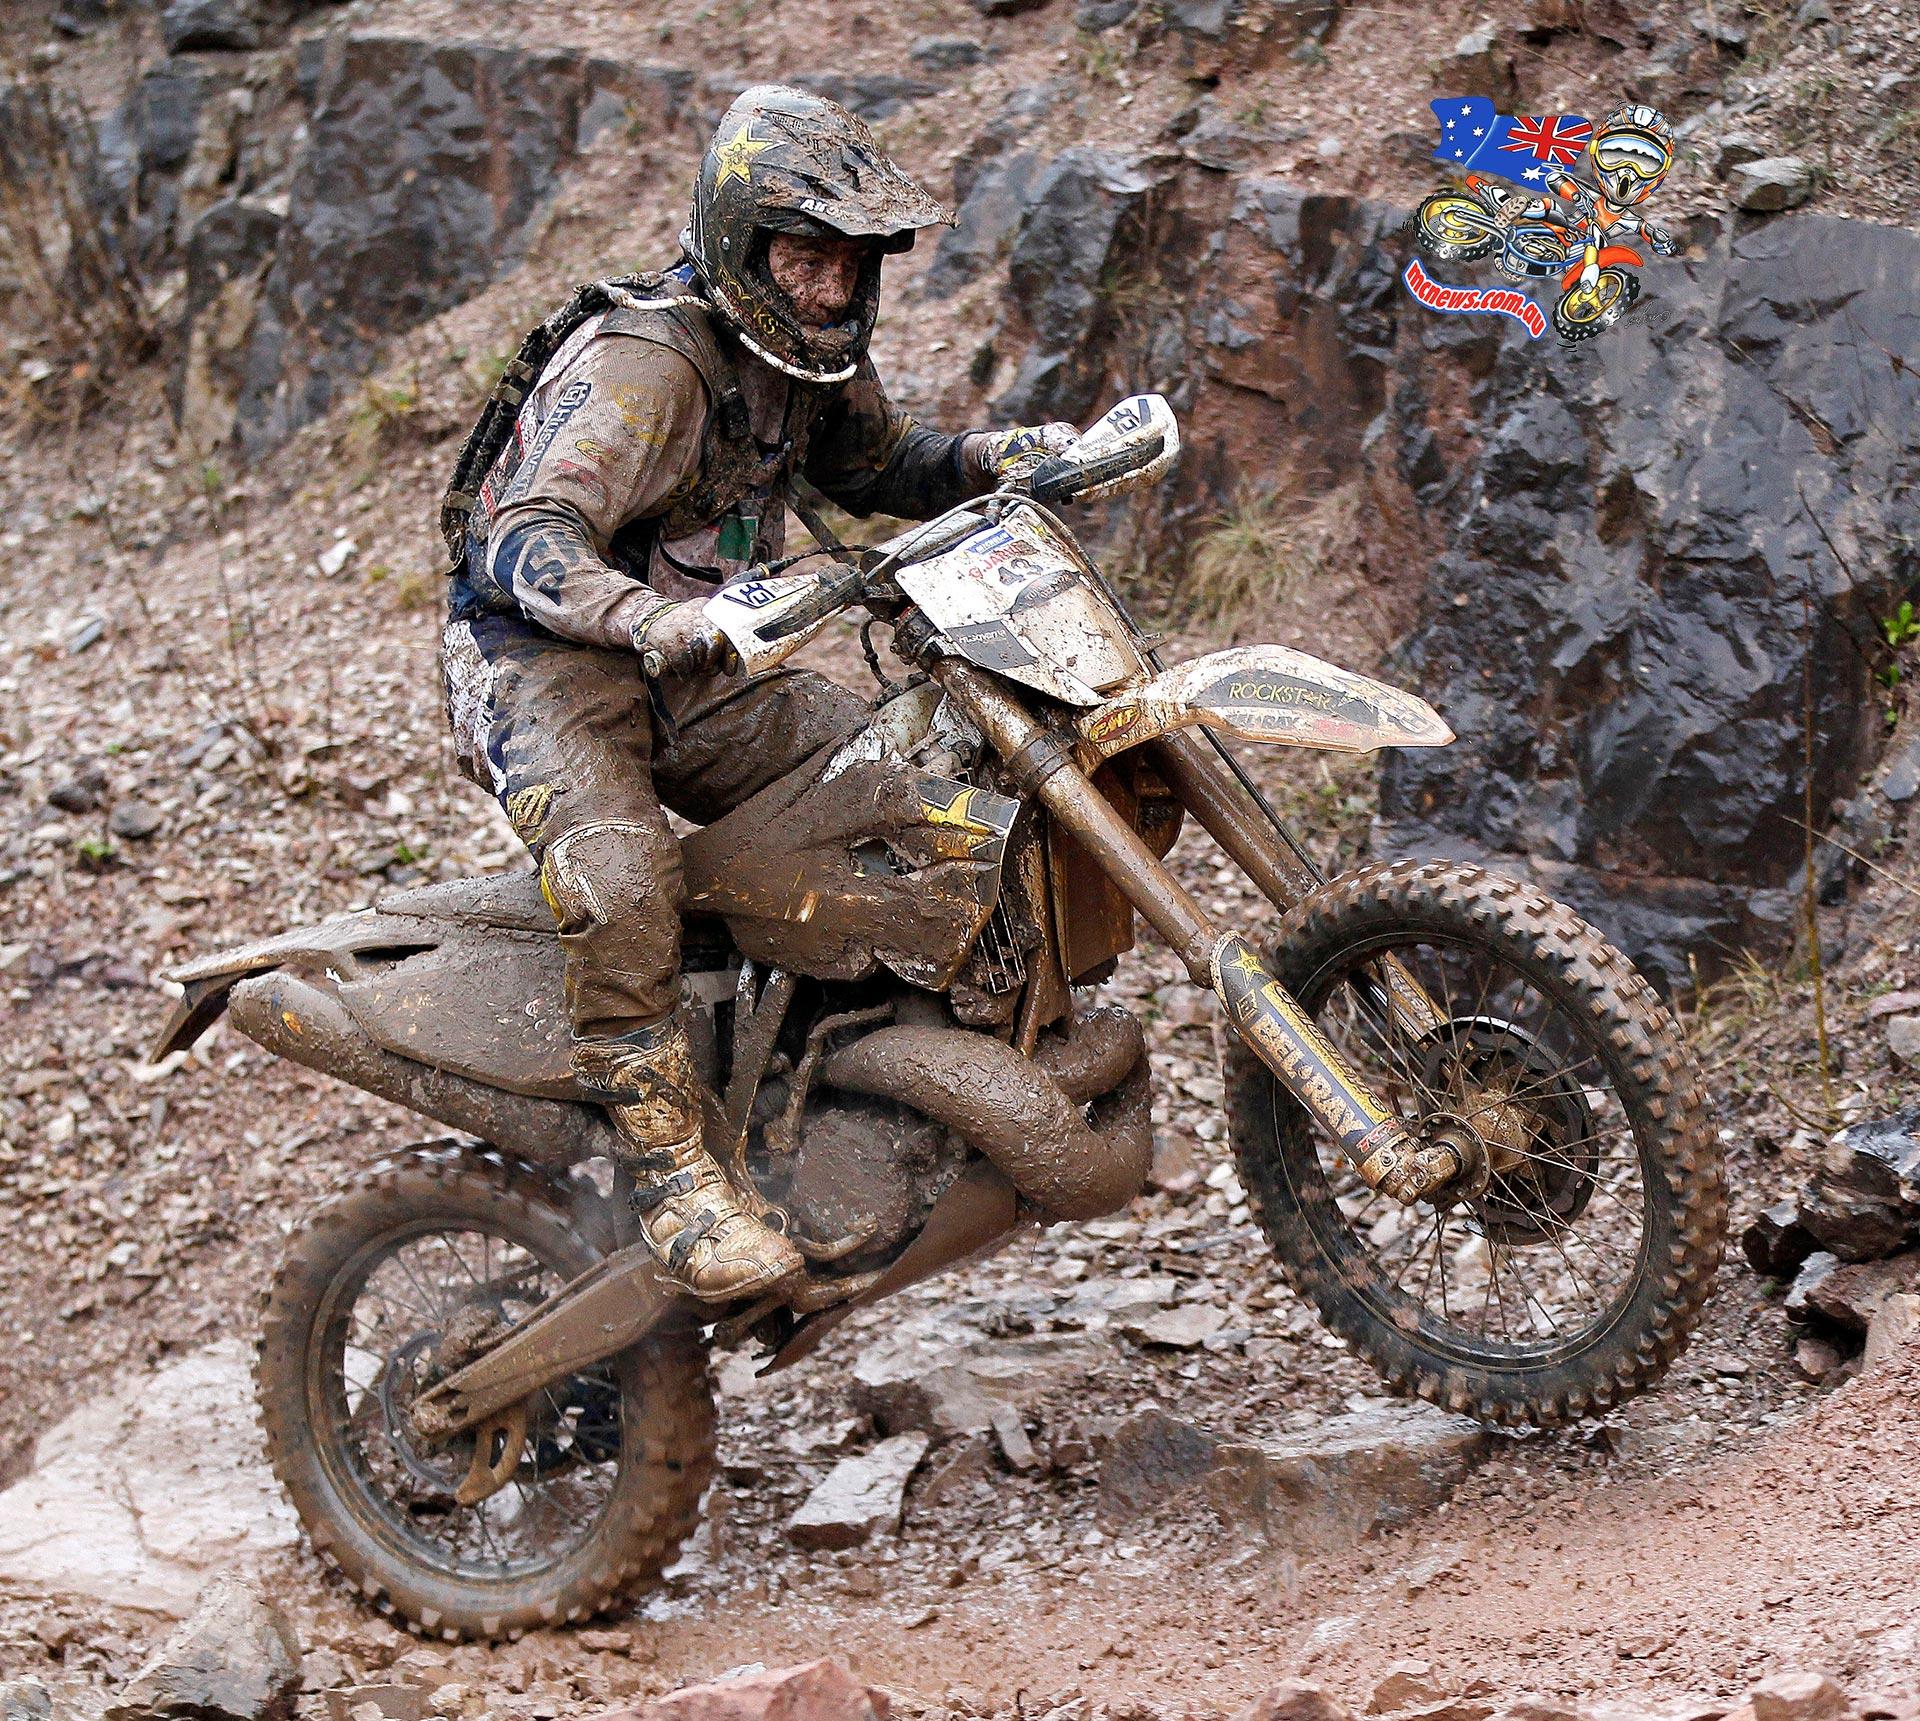 Graham Jarvis - The Tough One 2016 - Extreme Enduro